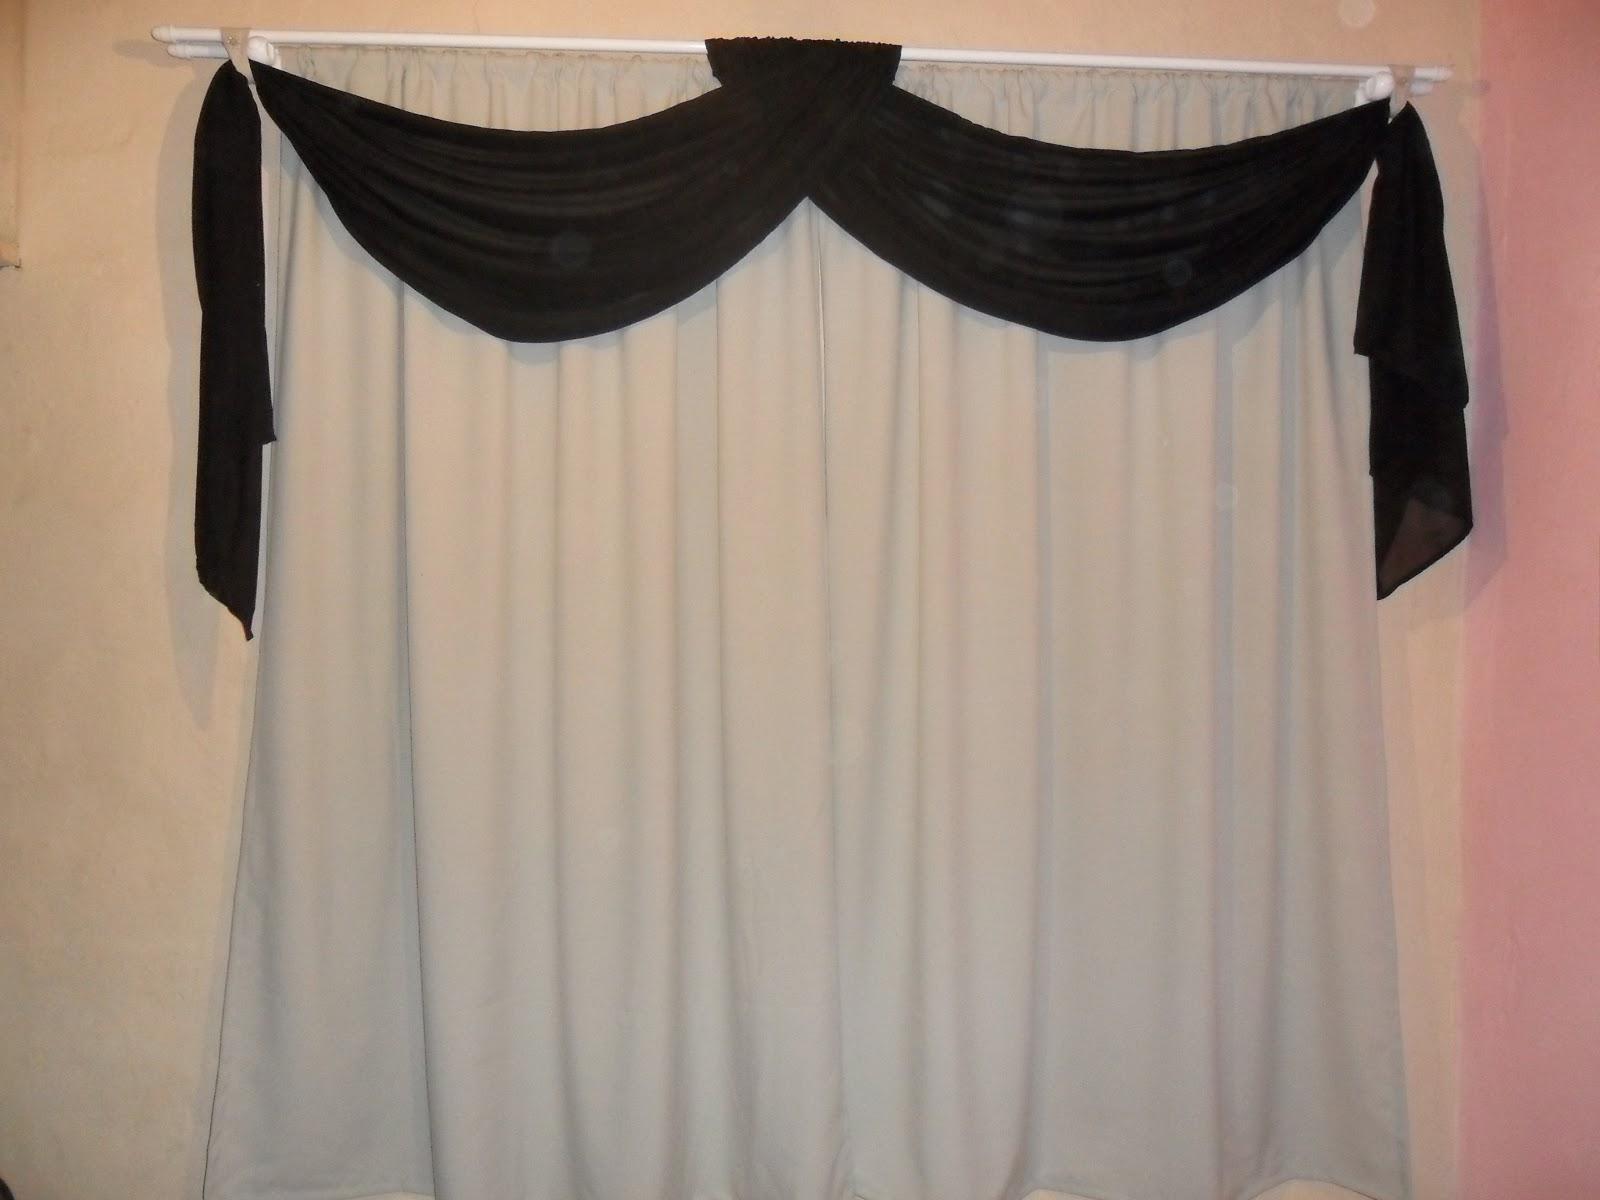 DECOARTDECORAOES cortinas oxford com bando musseline